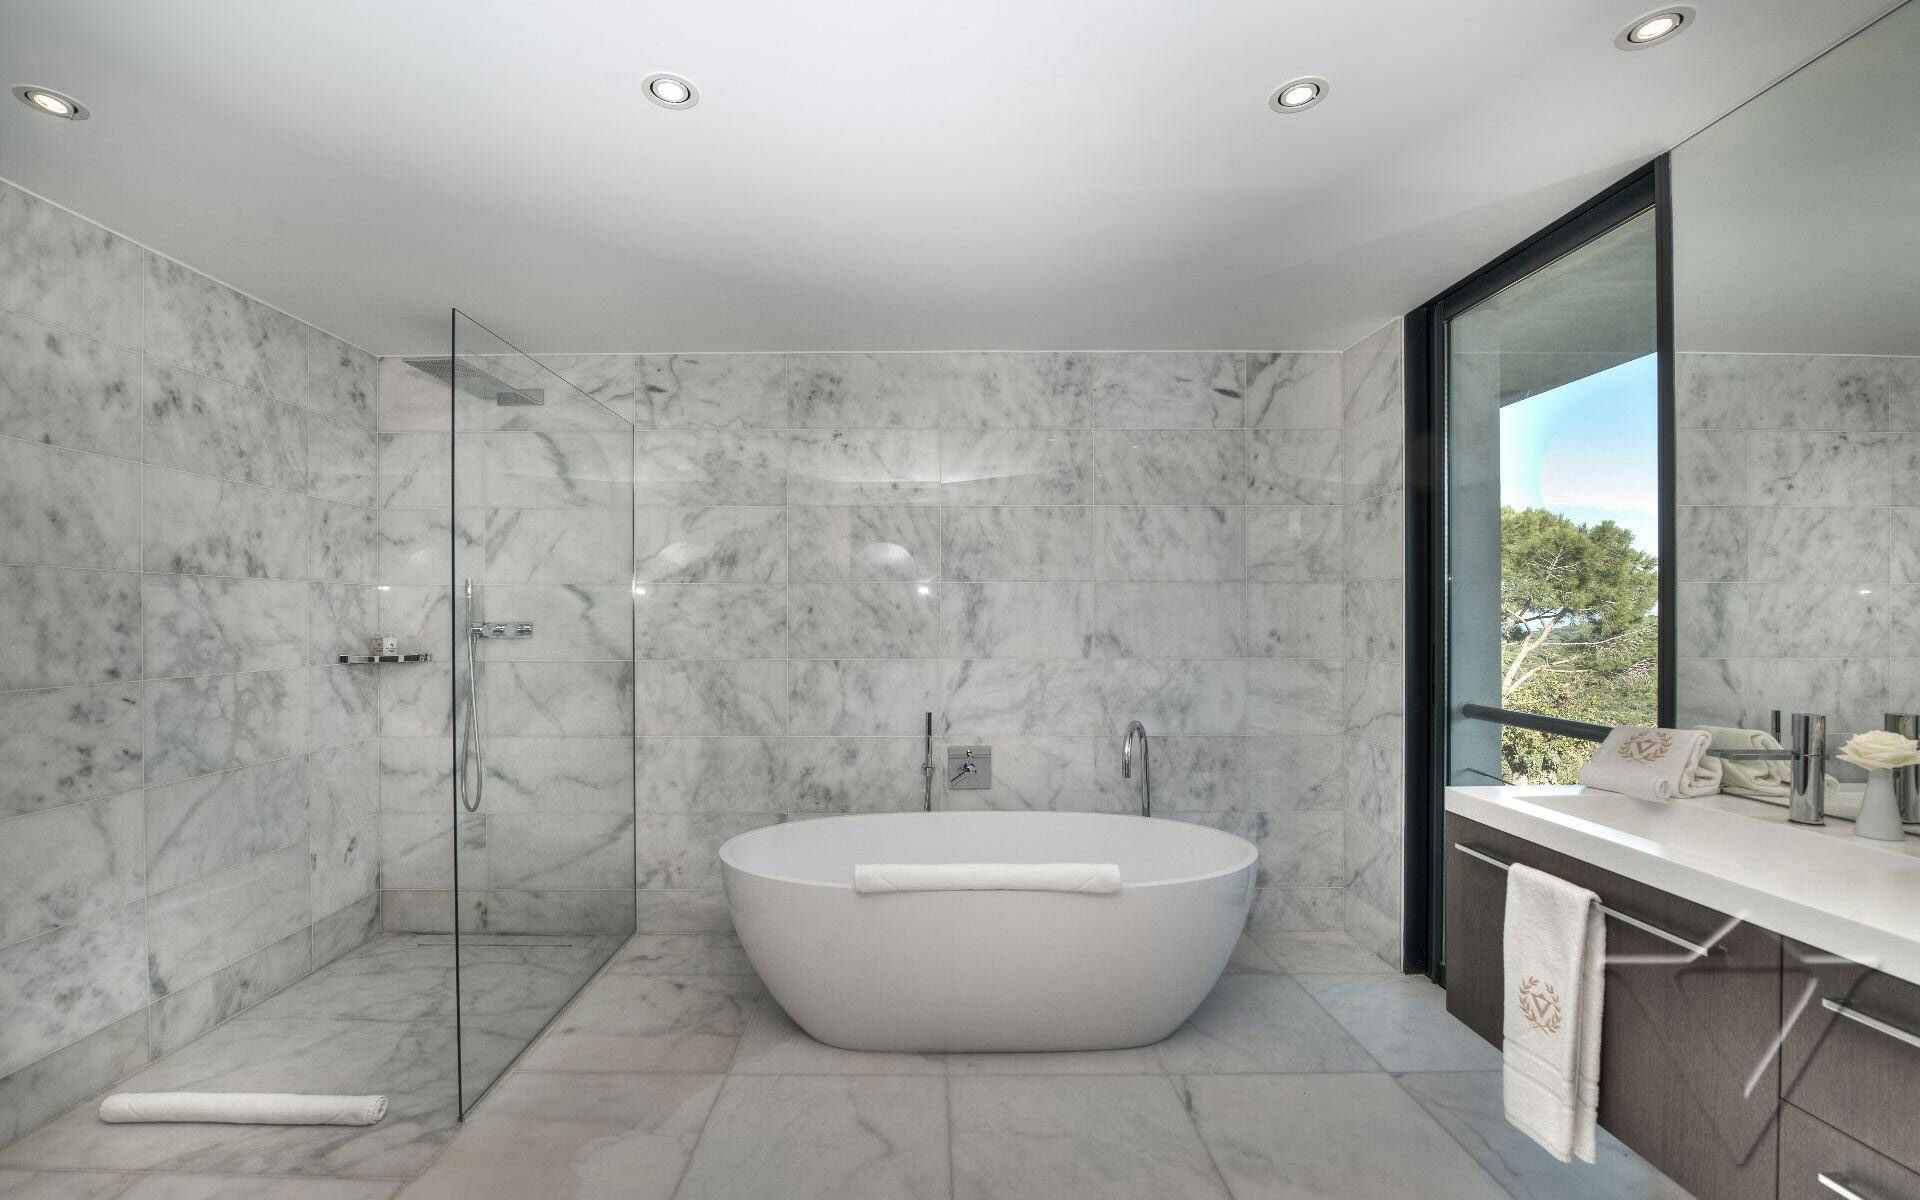 Glass Shower Screen, Bathroom, Luxury Holiday Villa in Saint-Tropez, France